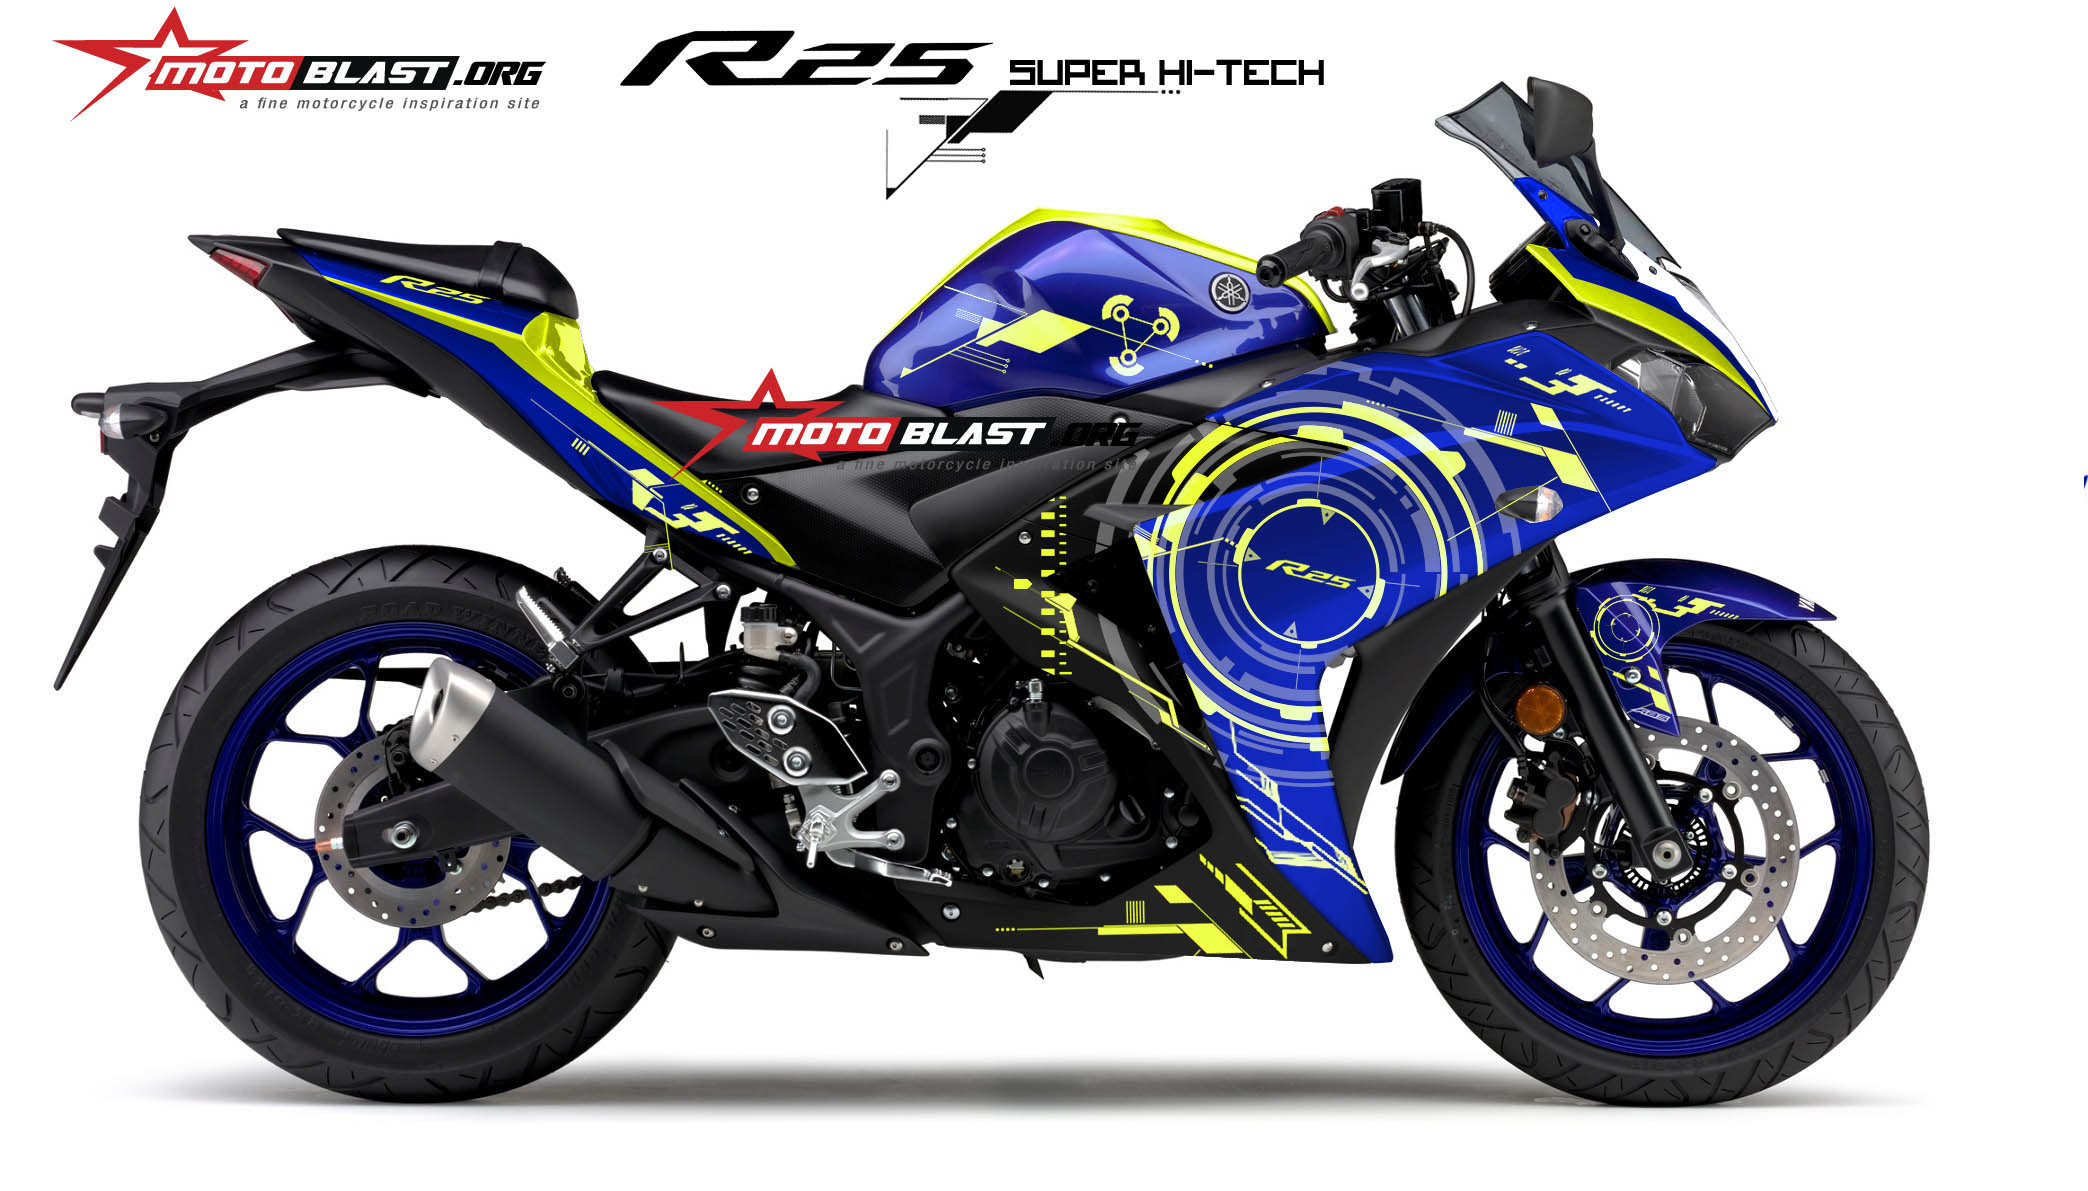 Graphic Kit Yamaha R25 – R3 Blue Super HI-TECH